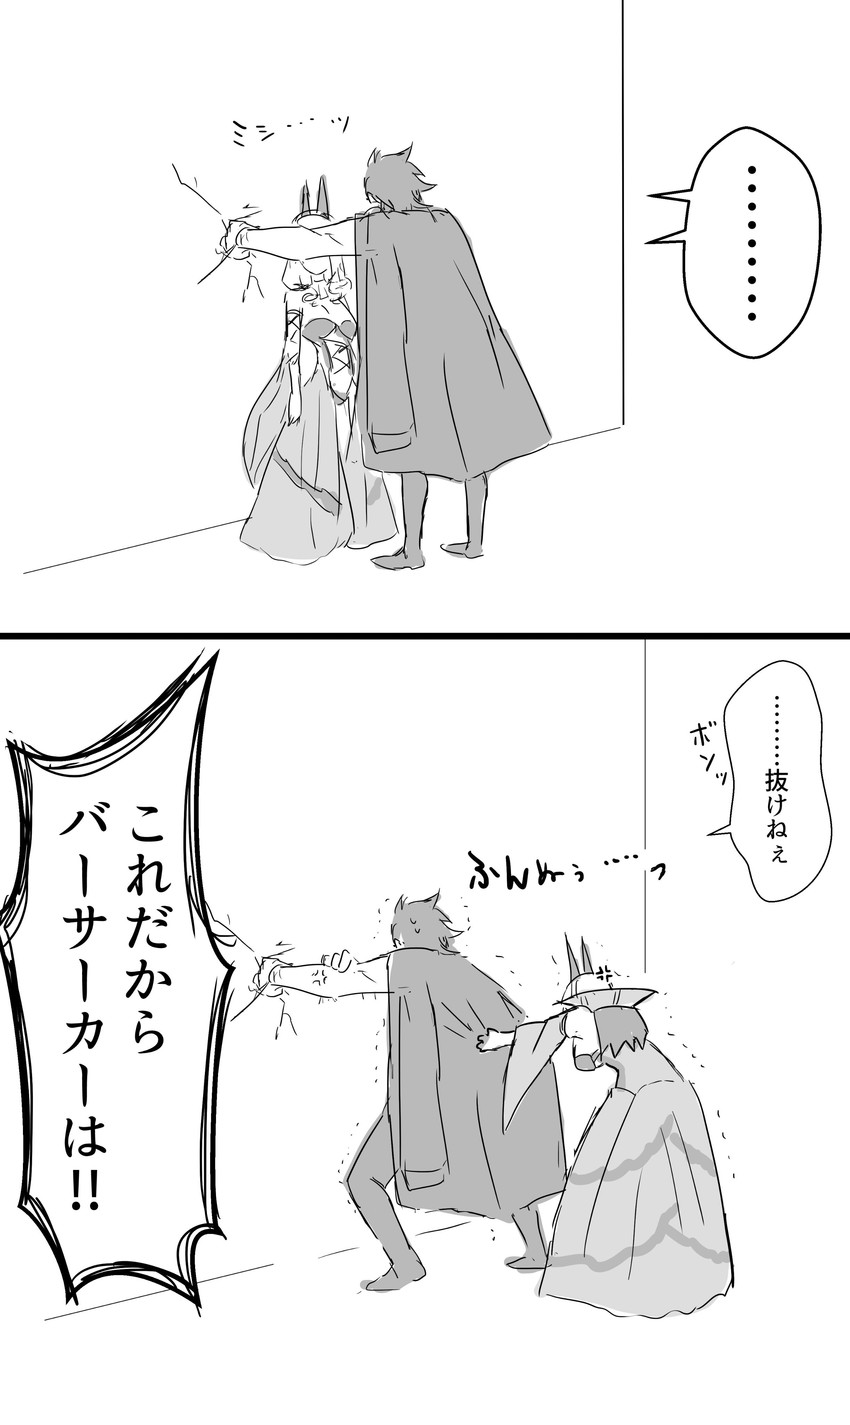 carmilla and hijikata toshizou (fate/grand order and etc